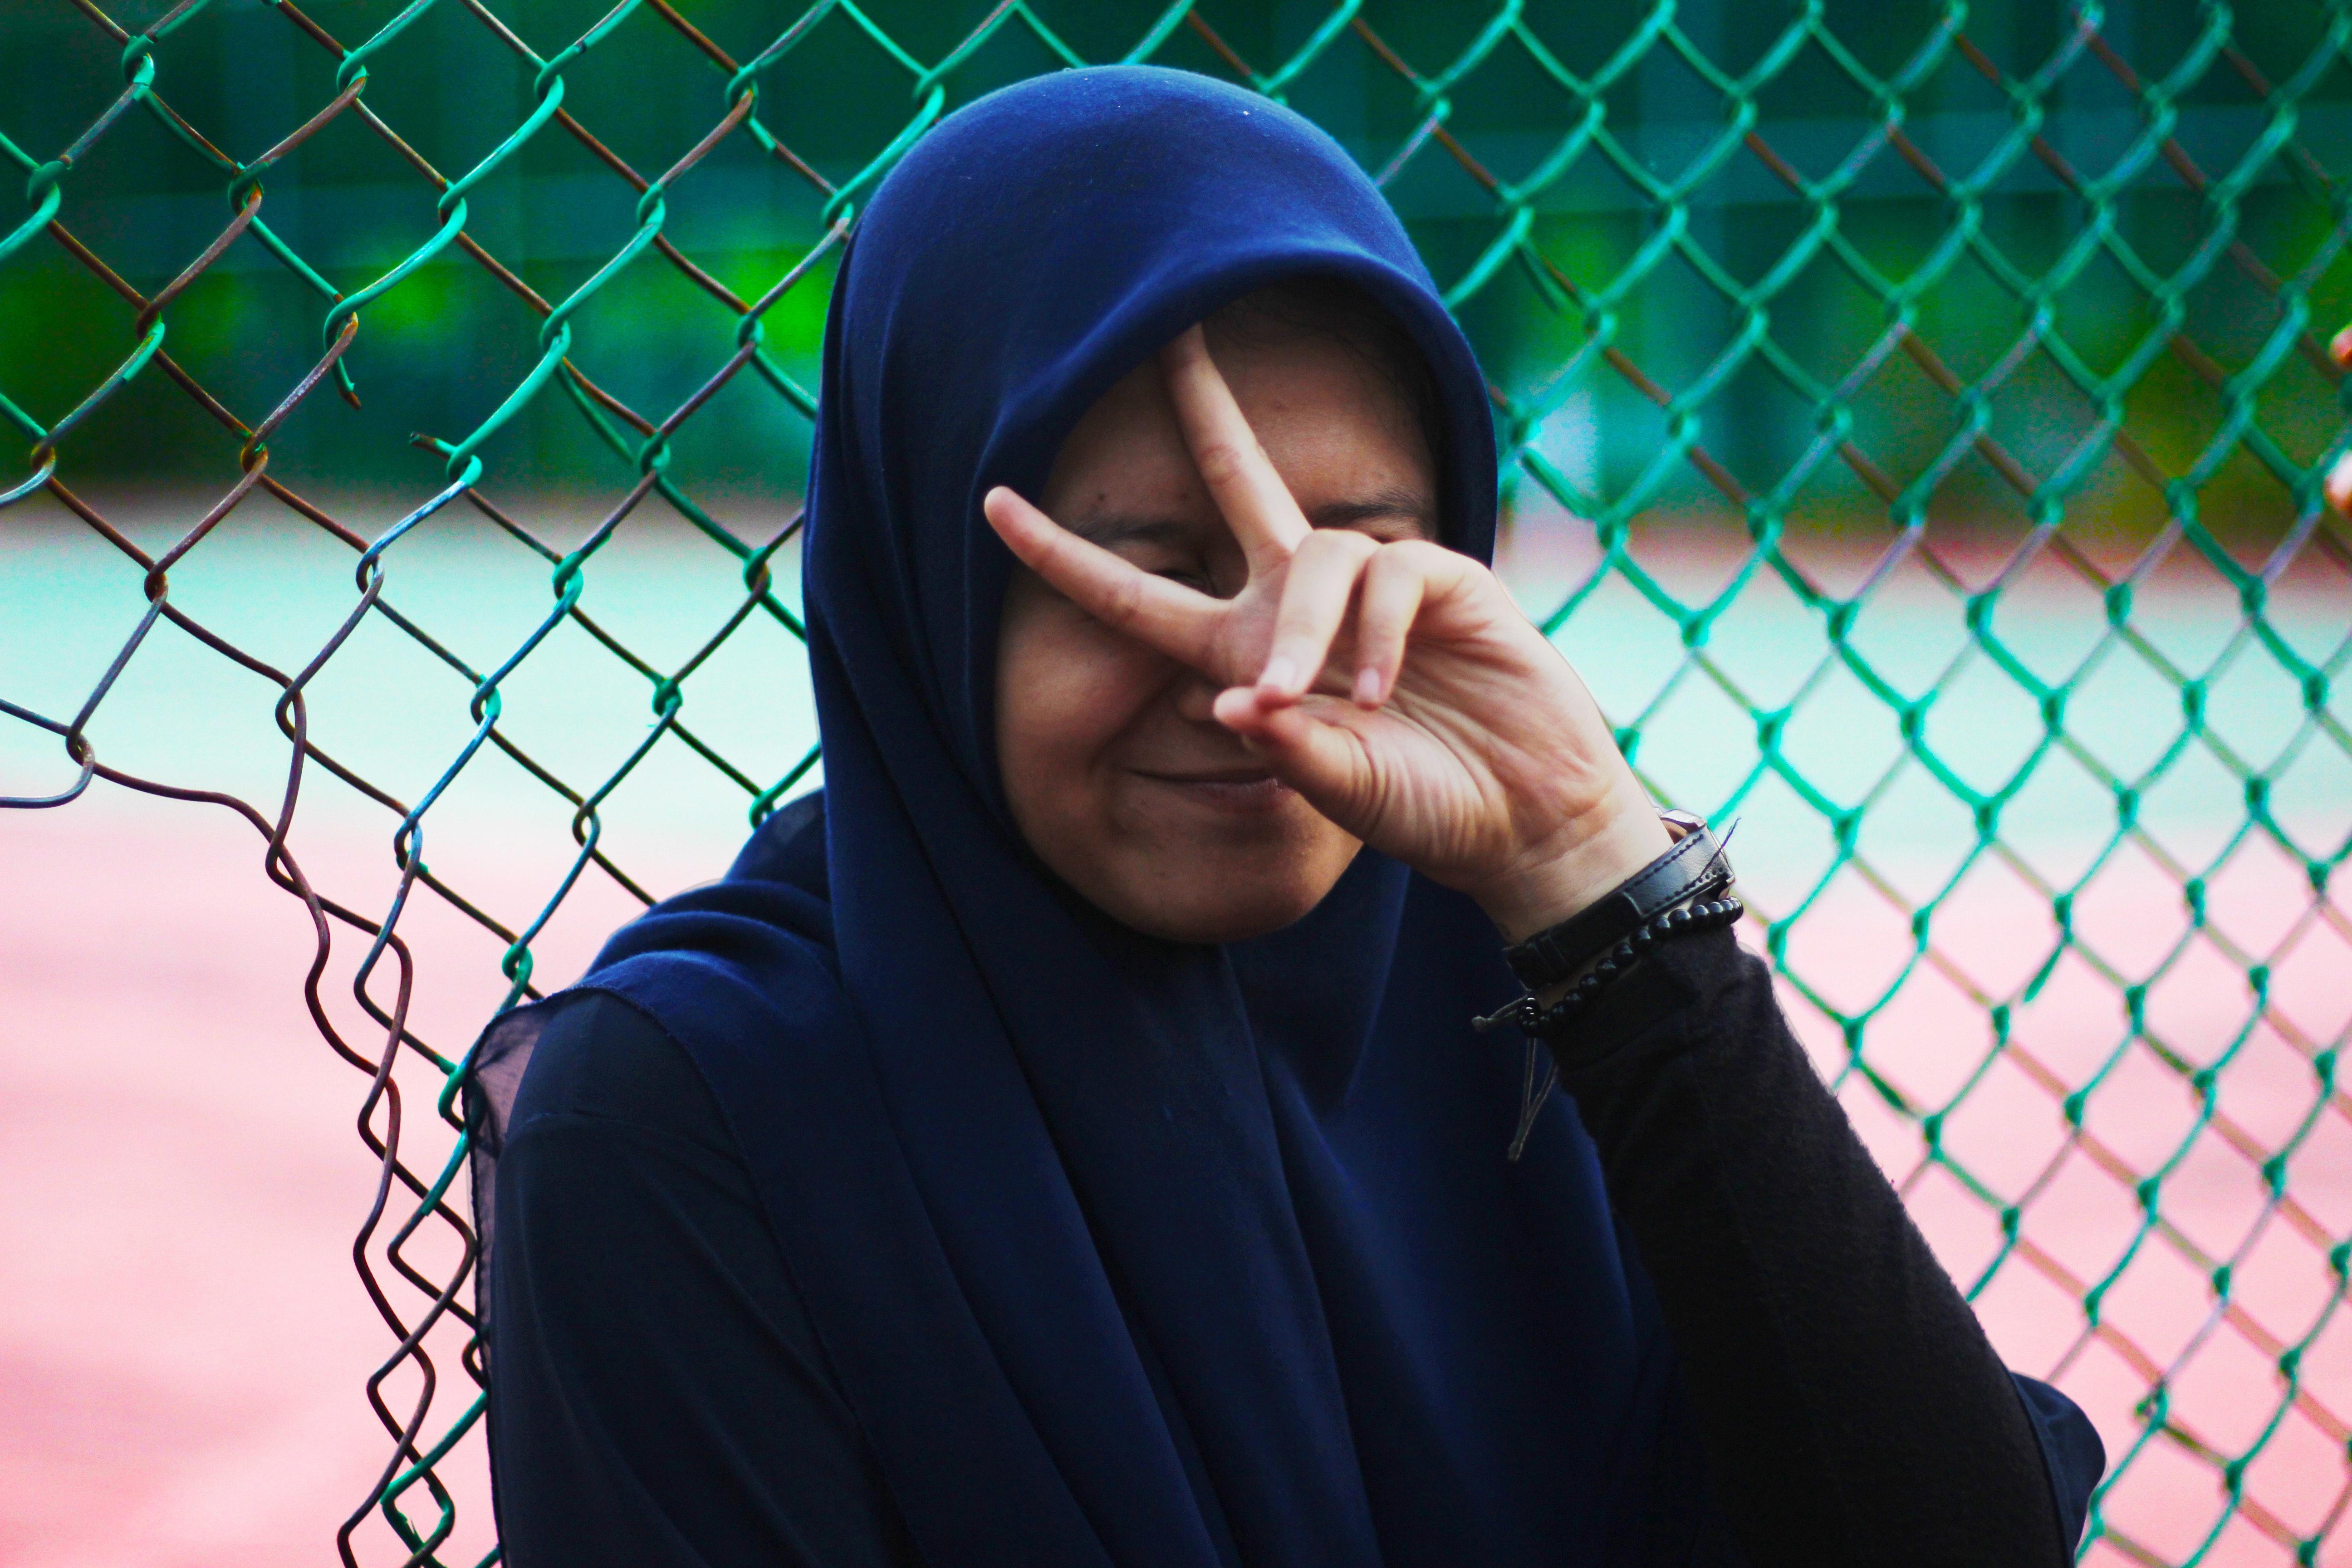 Woman wearing blue hijab photo